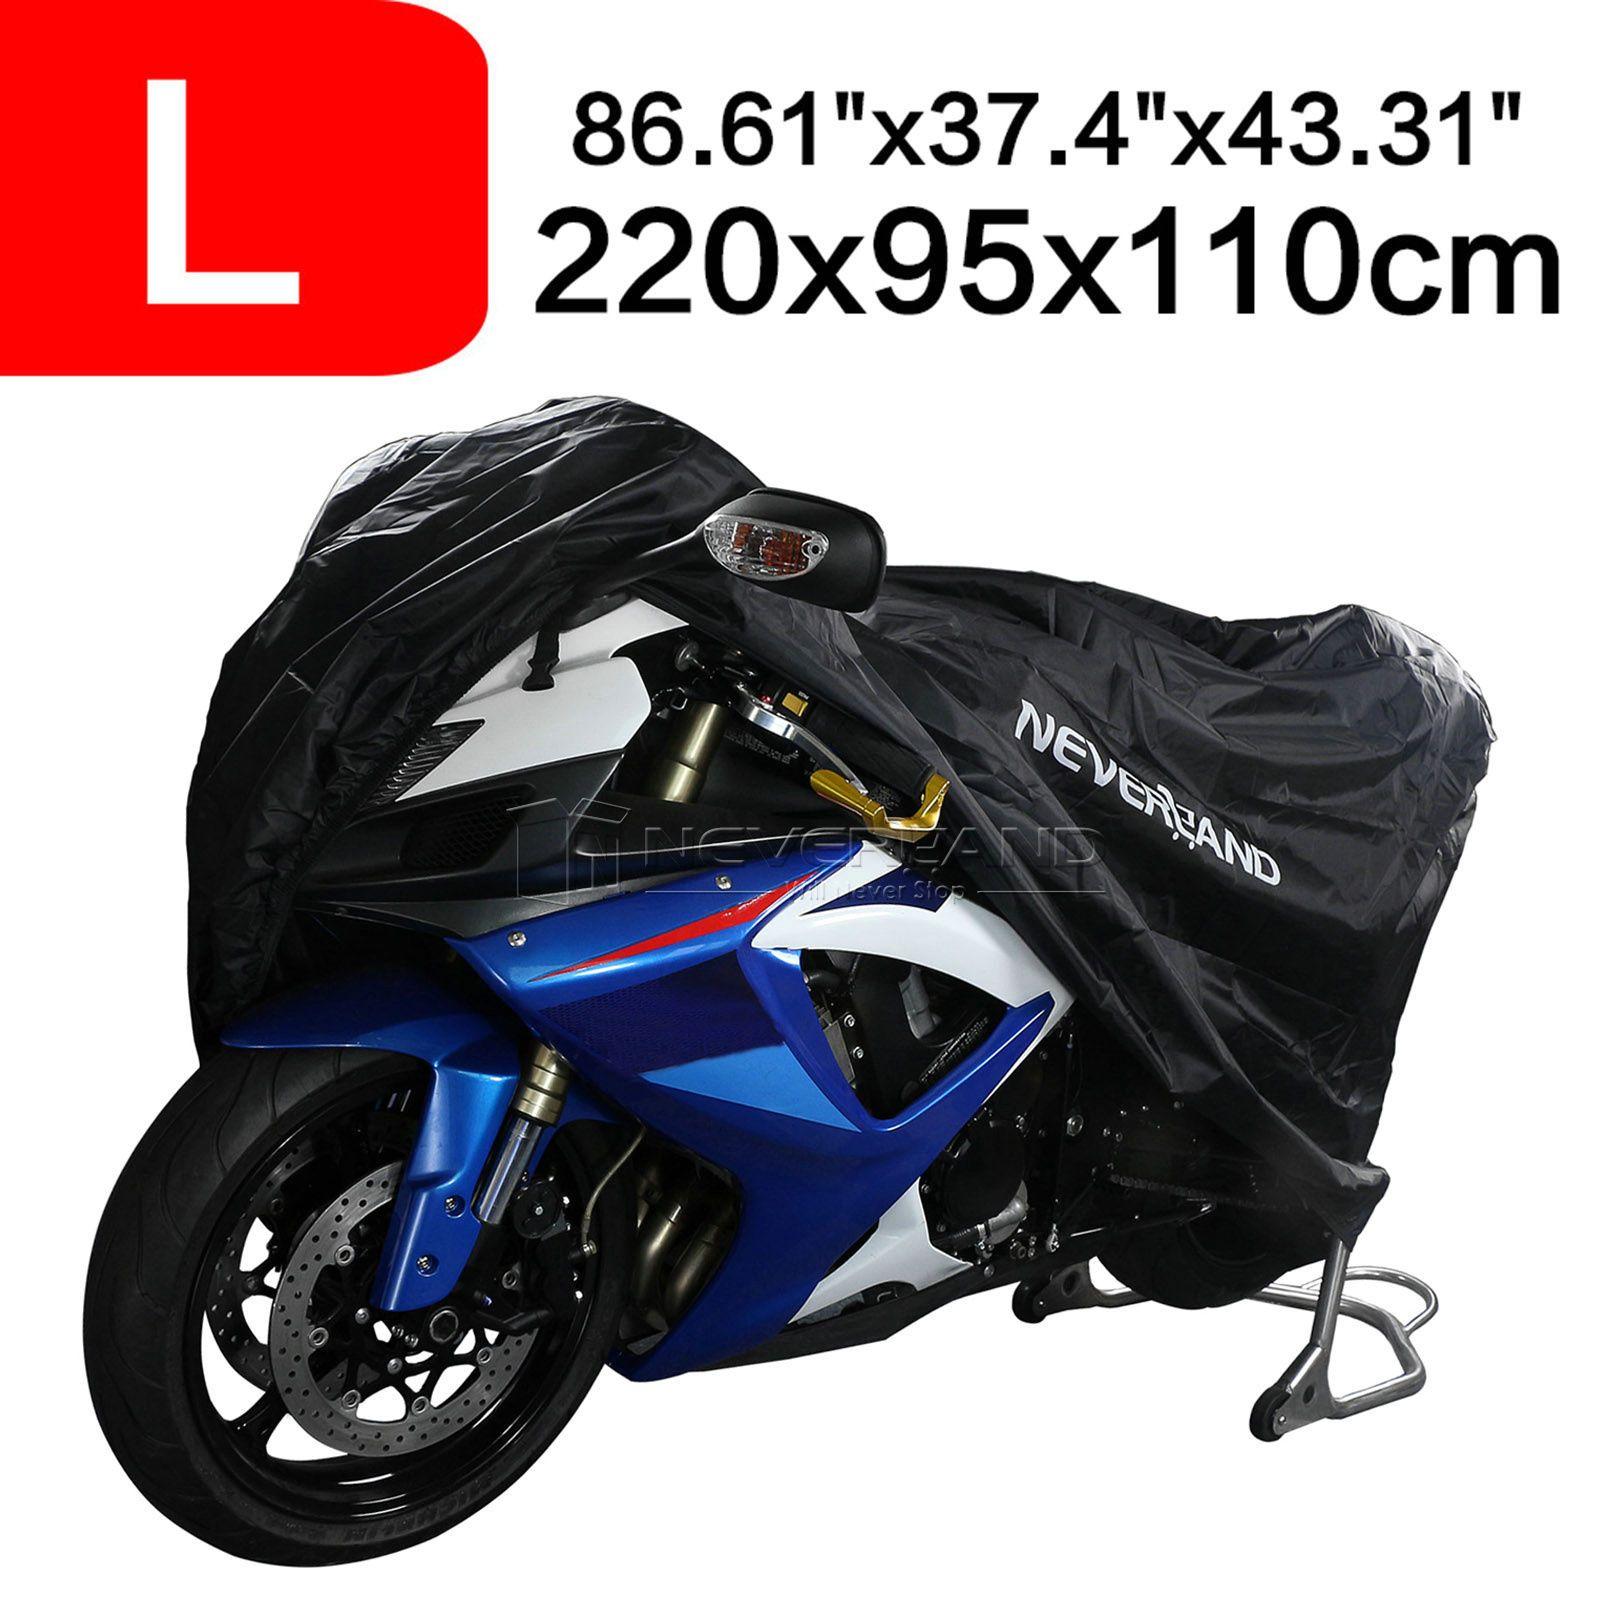 NEVERLAND Black Motorbike Polyester Taffeta Motorcycle Covers L Dust Waterproof Outdoor Rain UV Protector UV Cover D10